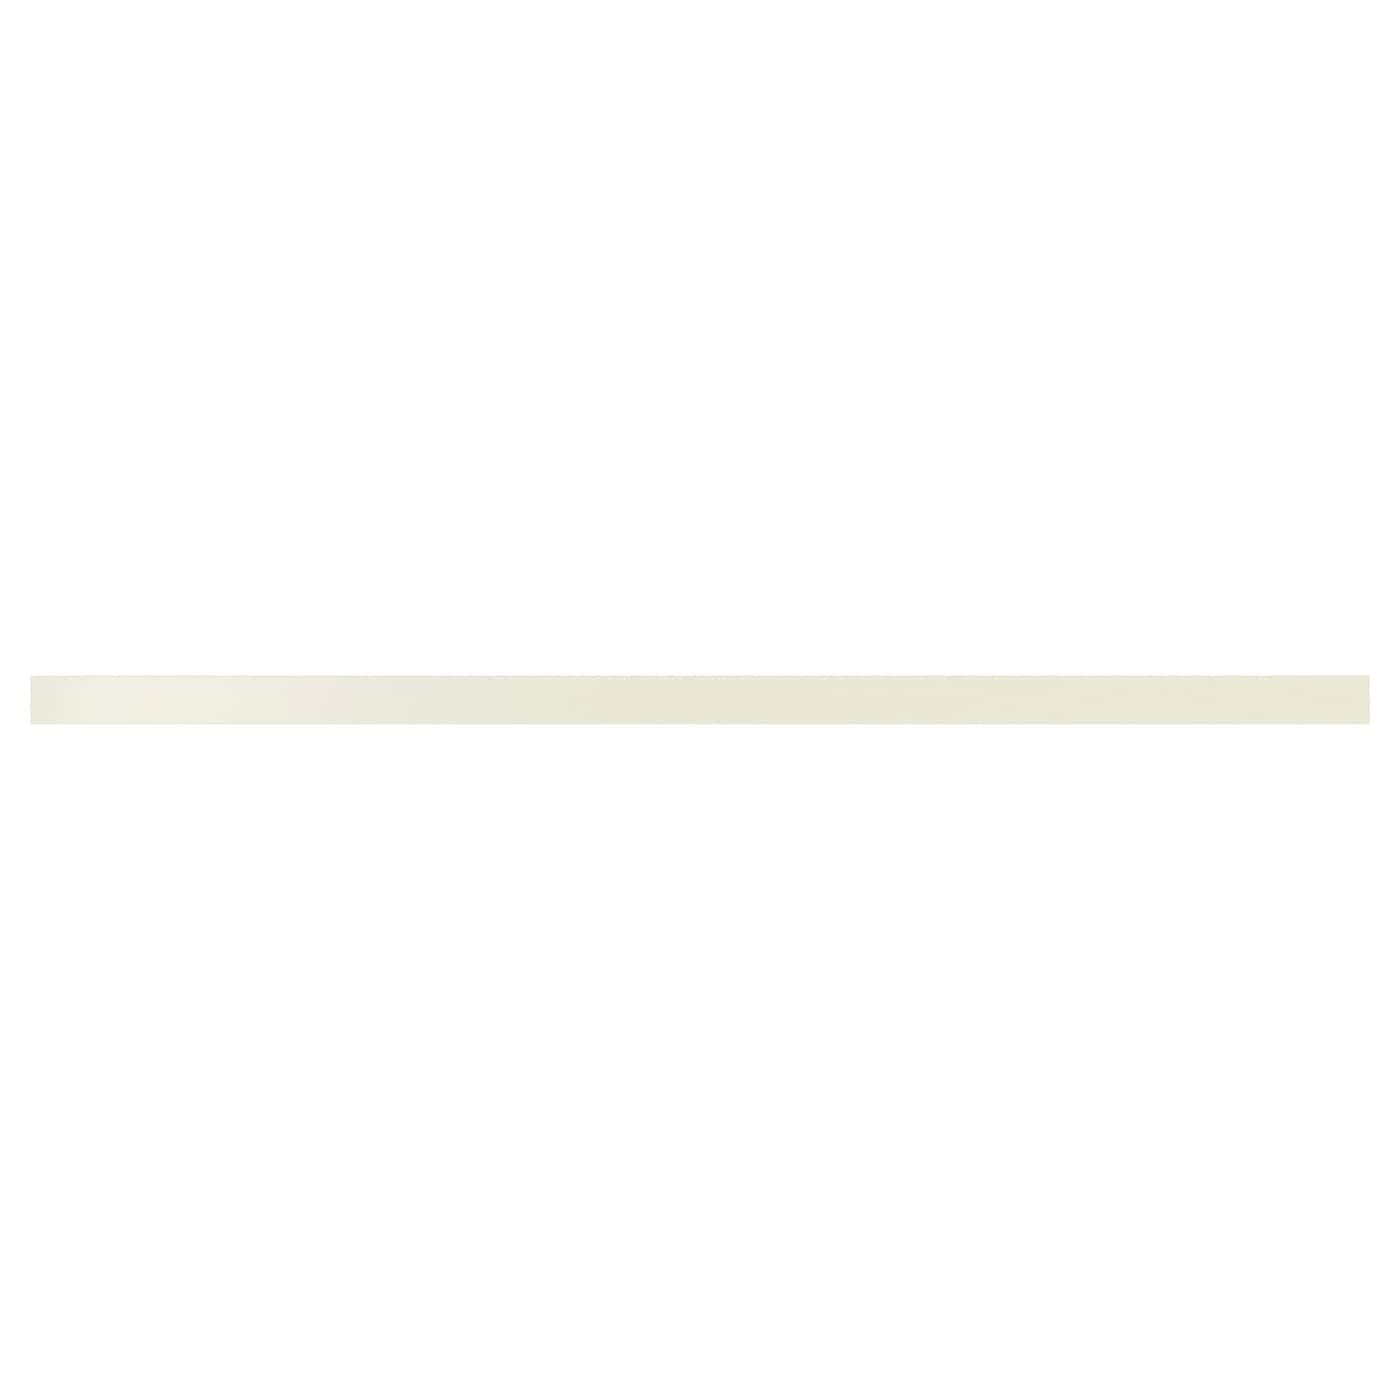 F rb ttra plinthe blanc cass 220x8 cm ikea - Plinthe cuisine ikea ...